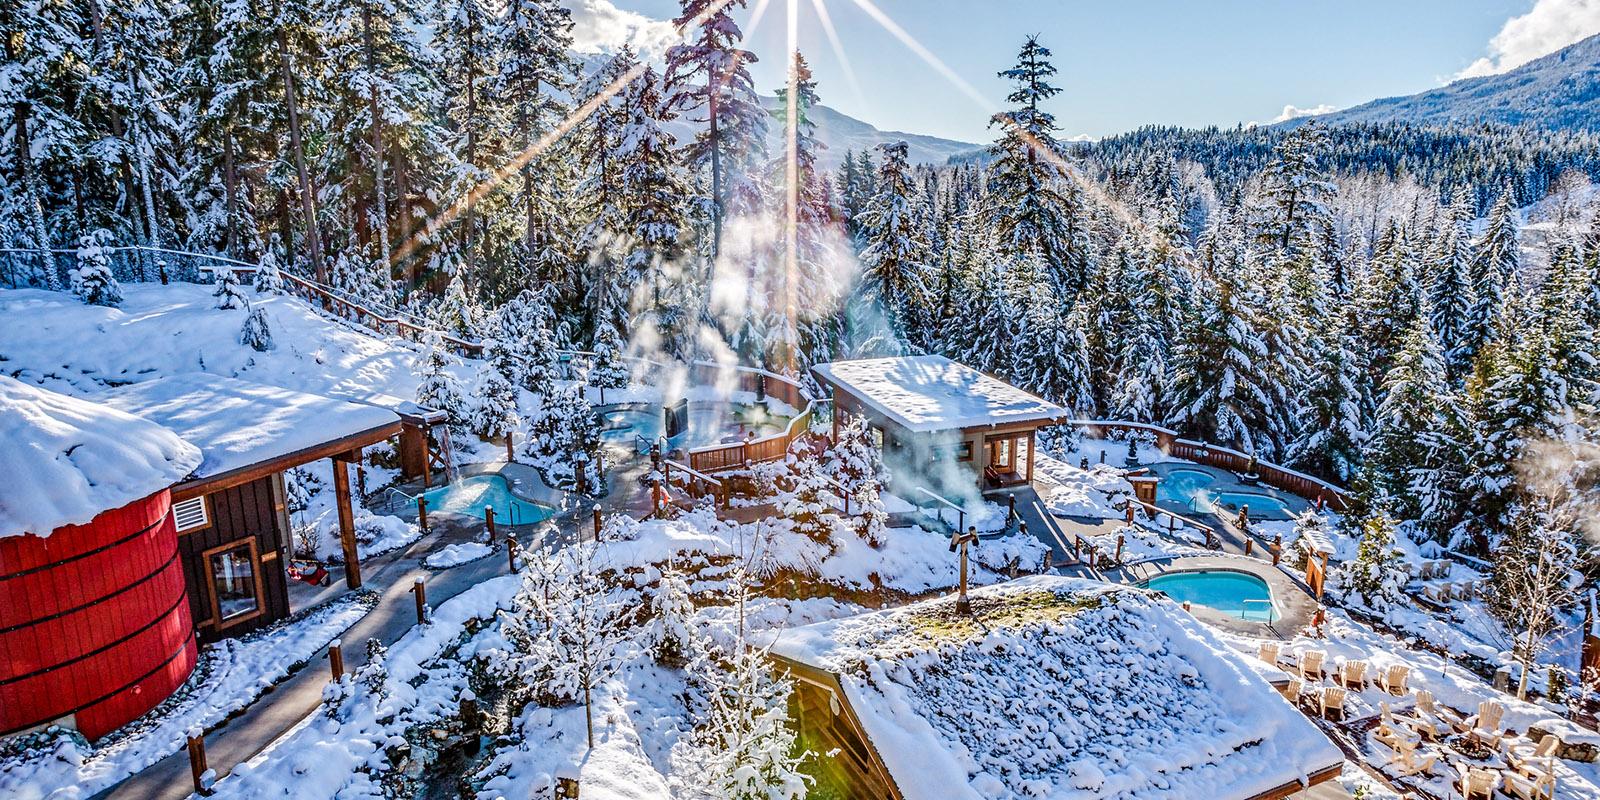 Whistler British Columbia Snowy Accommodations